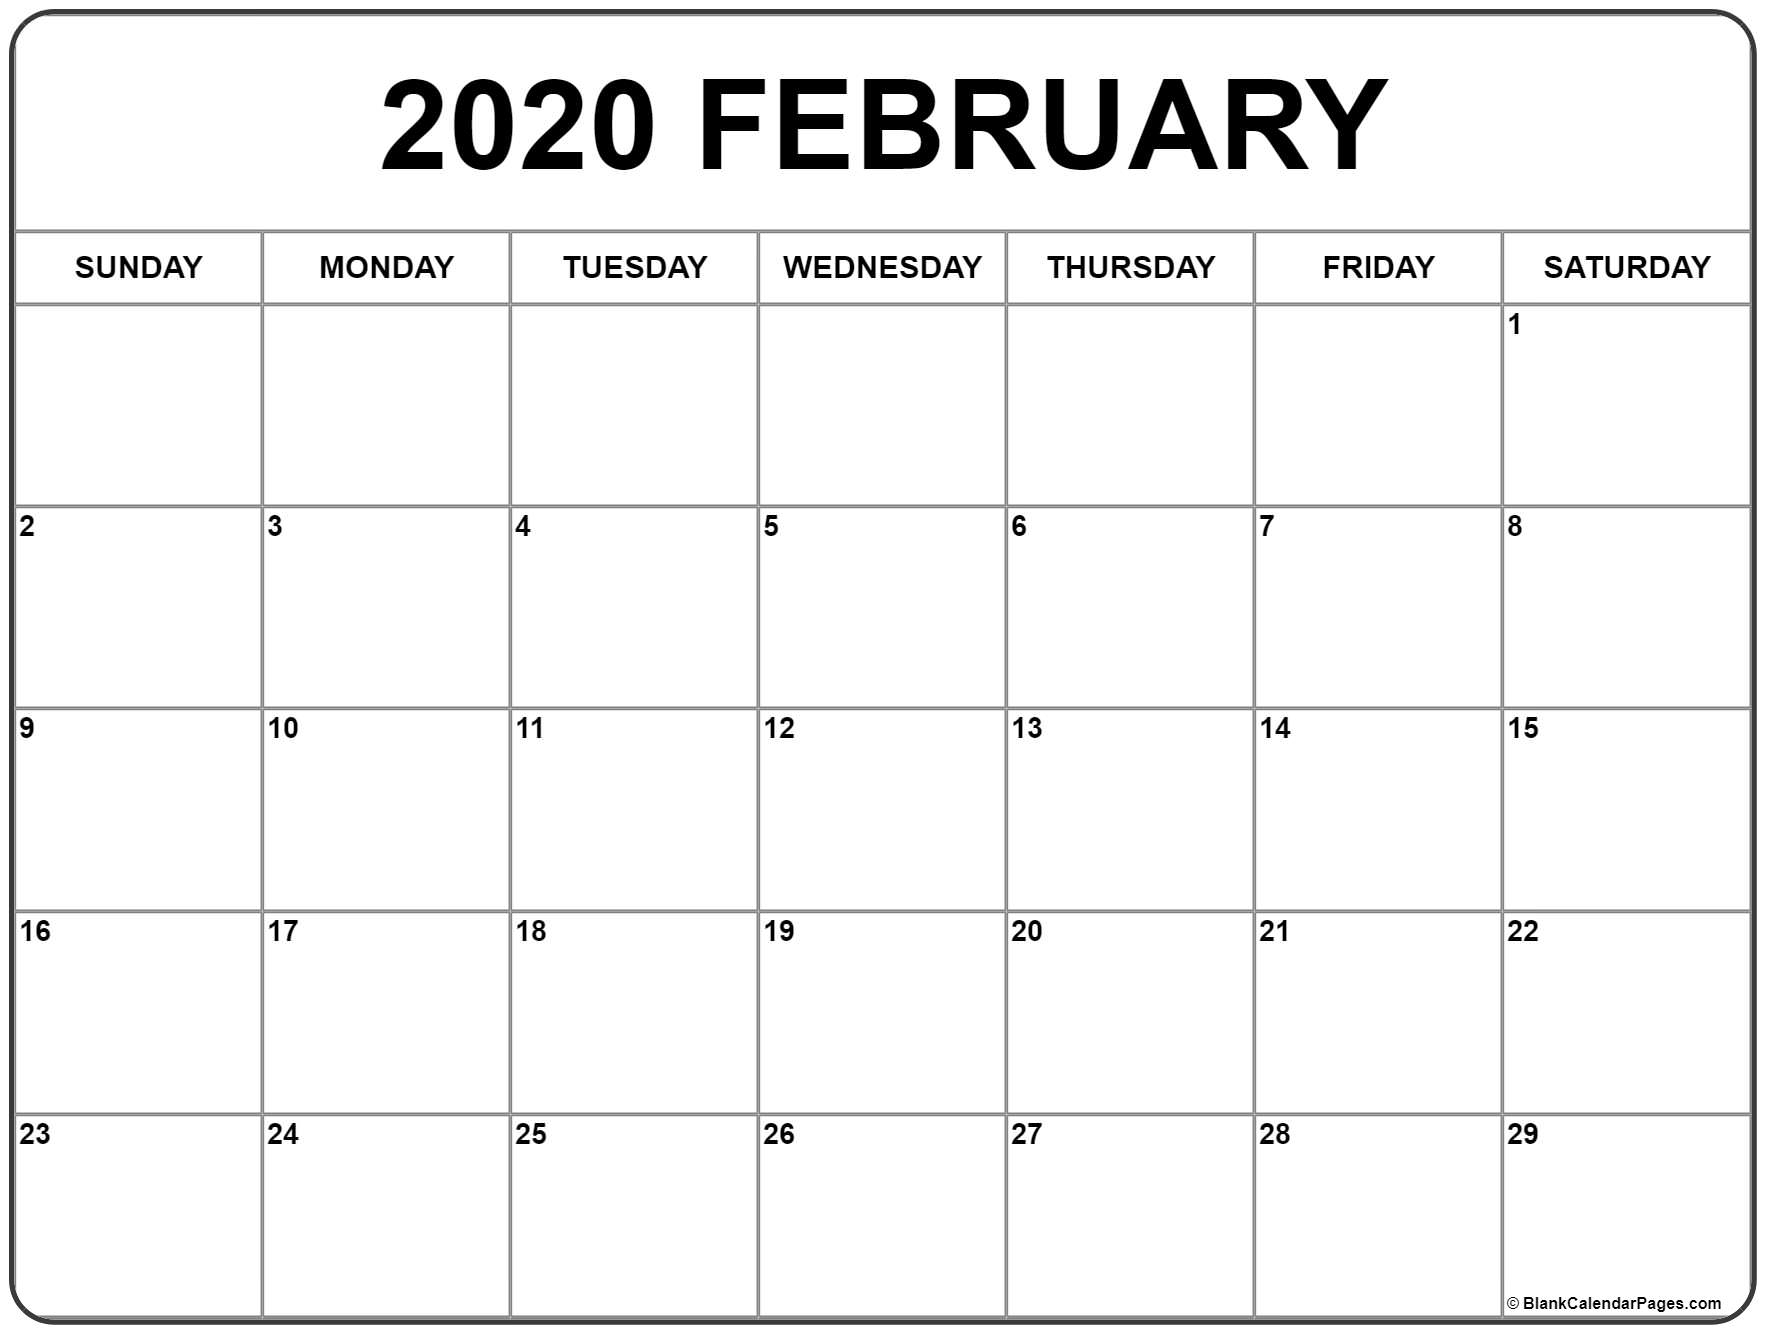 February 2020 Calendar | Free Printable Monthly Calendars in Large Print 2020 Calendar To Print Free